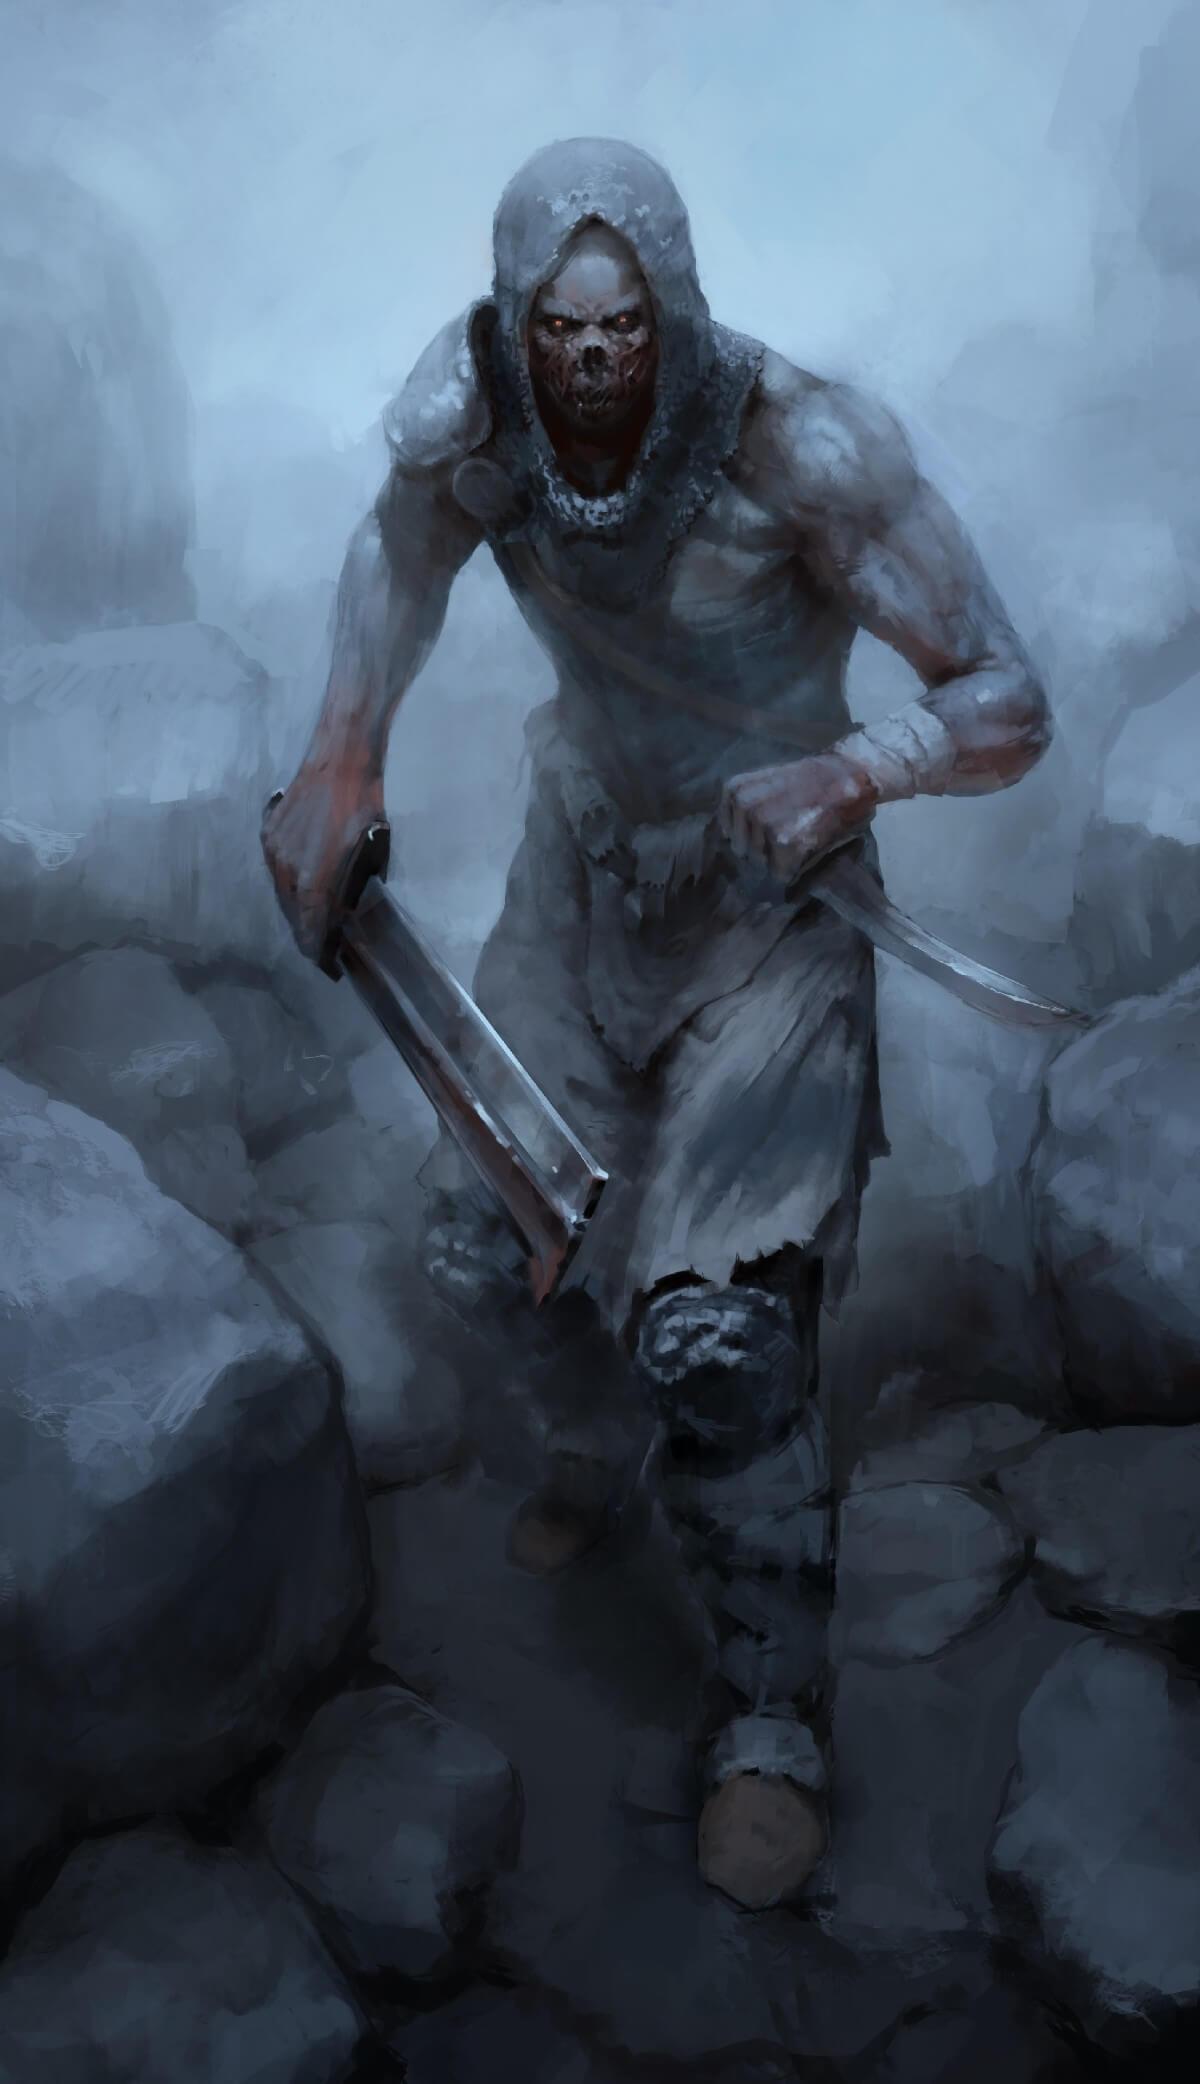 'Frost Warrior' by Paweł Hordyniak, Poland   Viking Warrior Challenge by Huntlancer